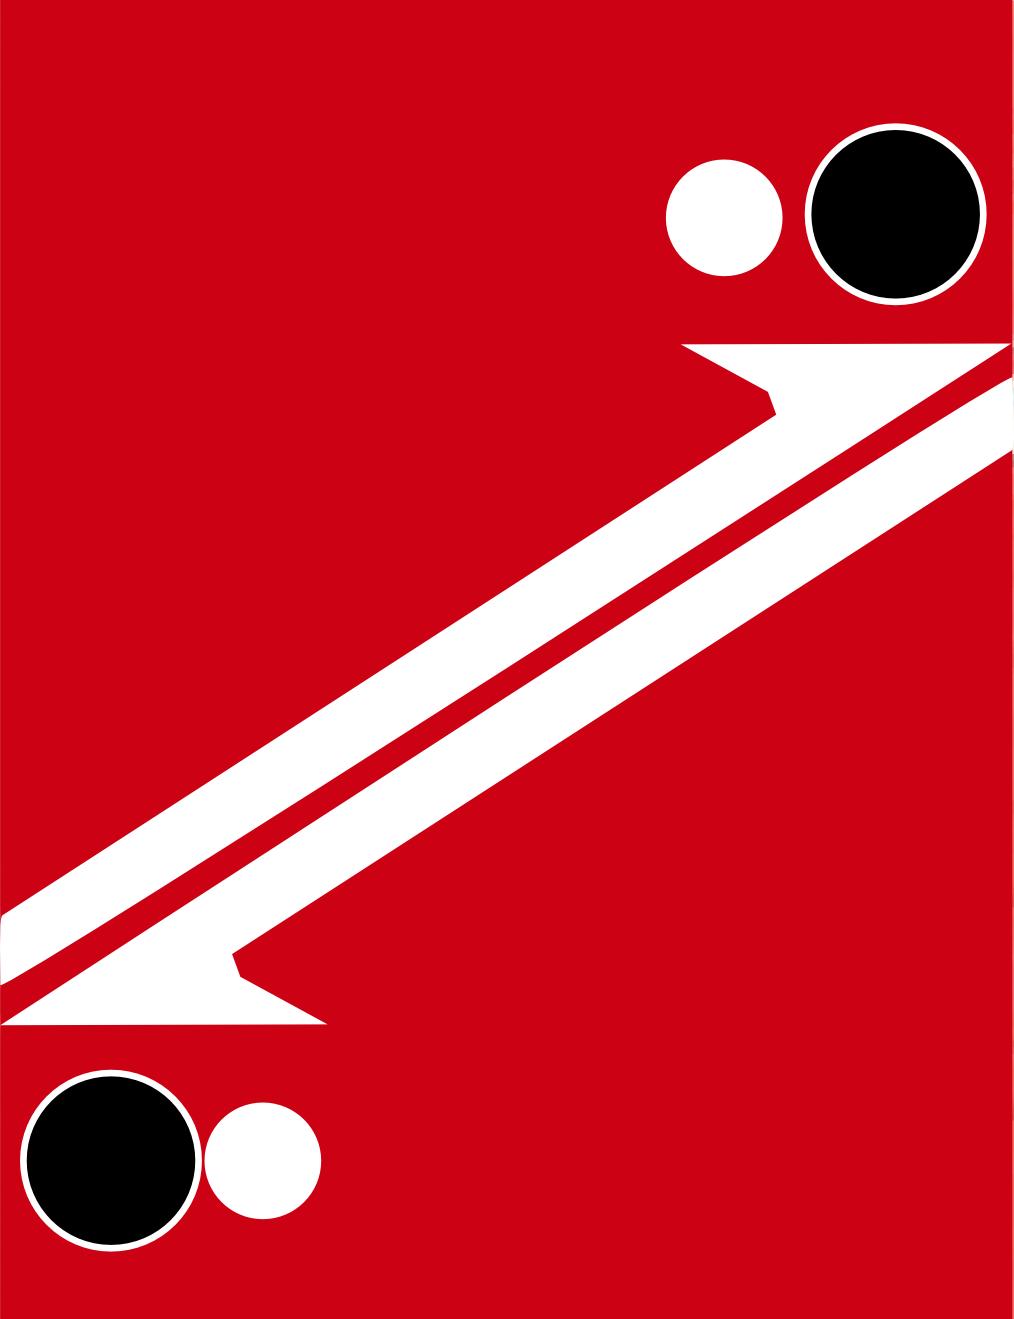 Keski-Suomen Kemistiseura